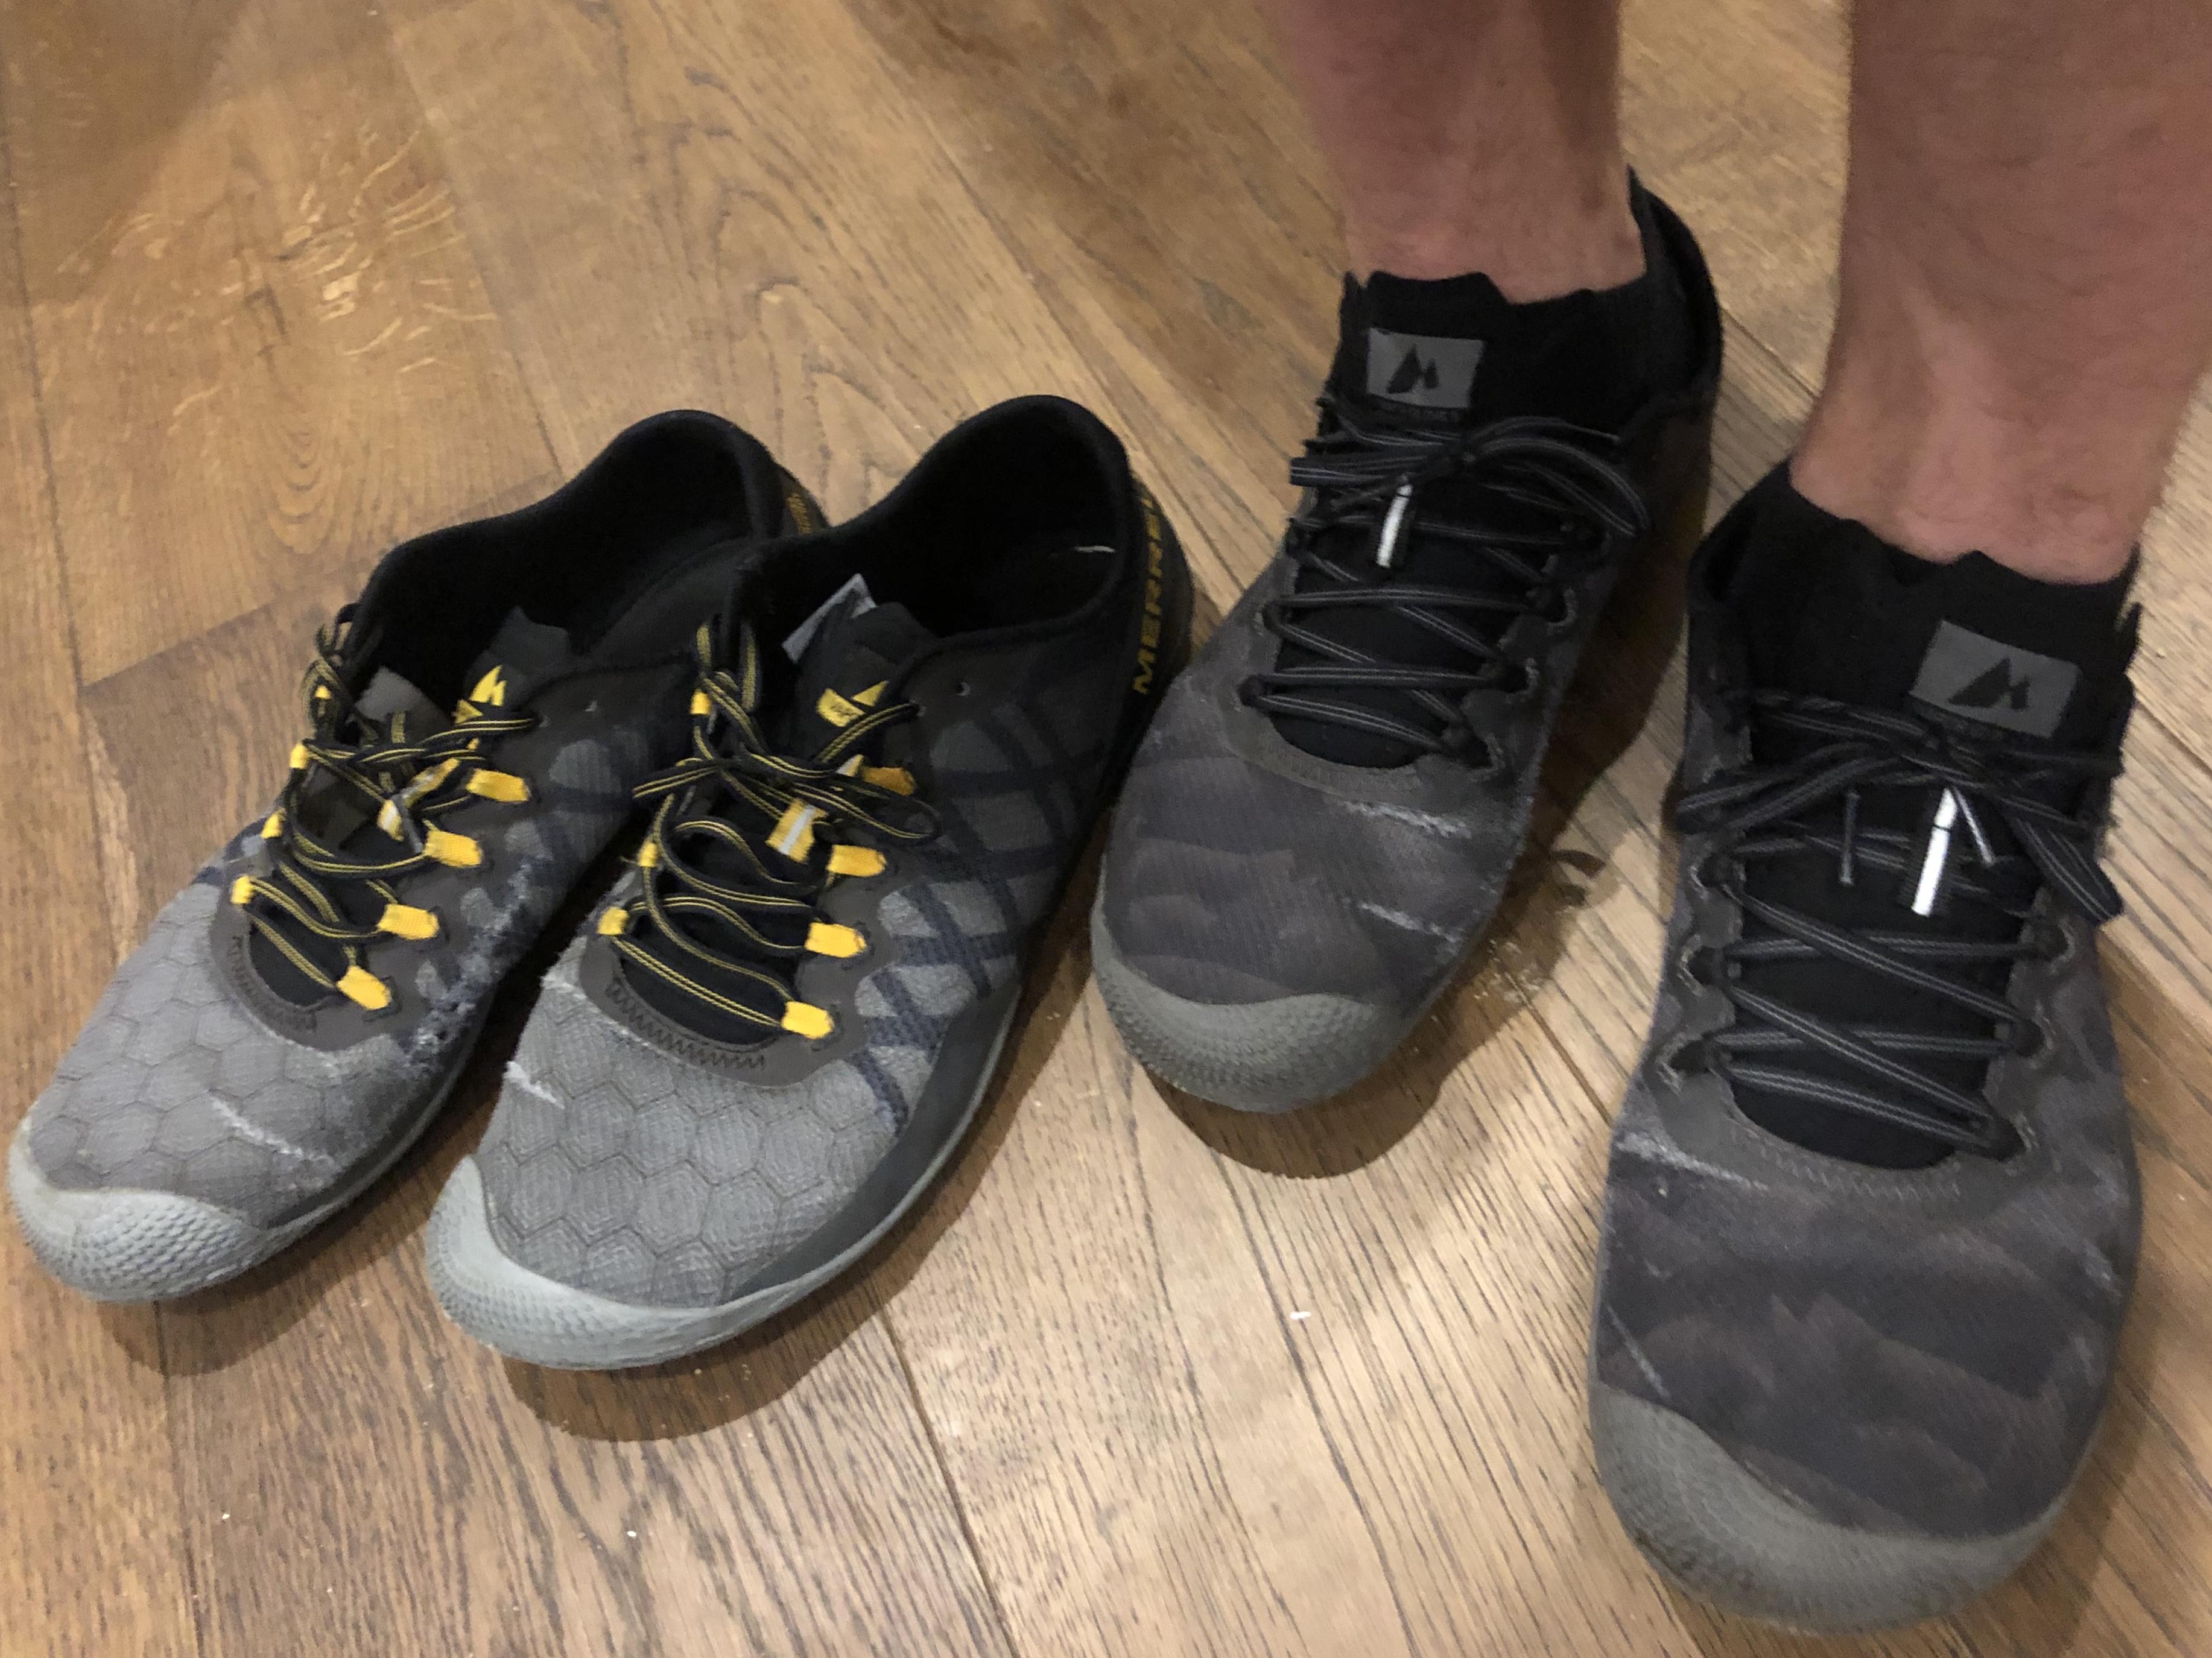 Details about Merrell Vapor Glove 3 Men's Barefoot Shoes J09679 Green Barefoot Shoes Fitness